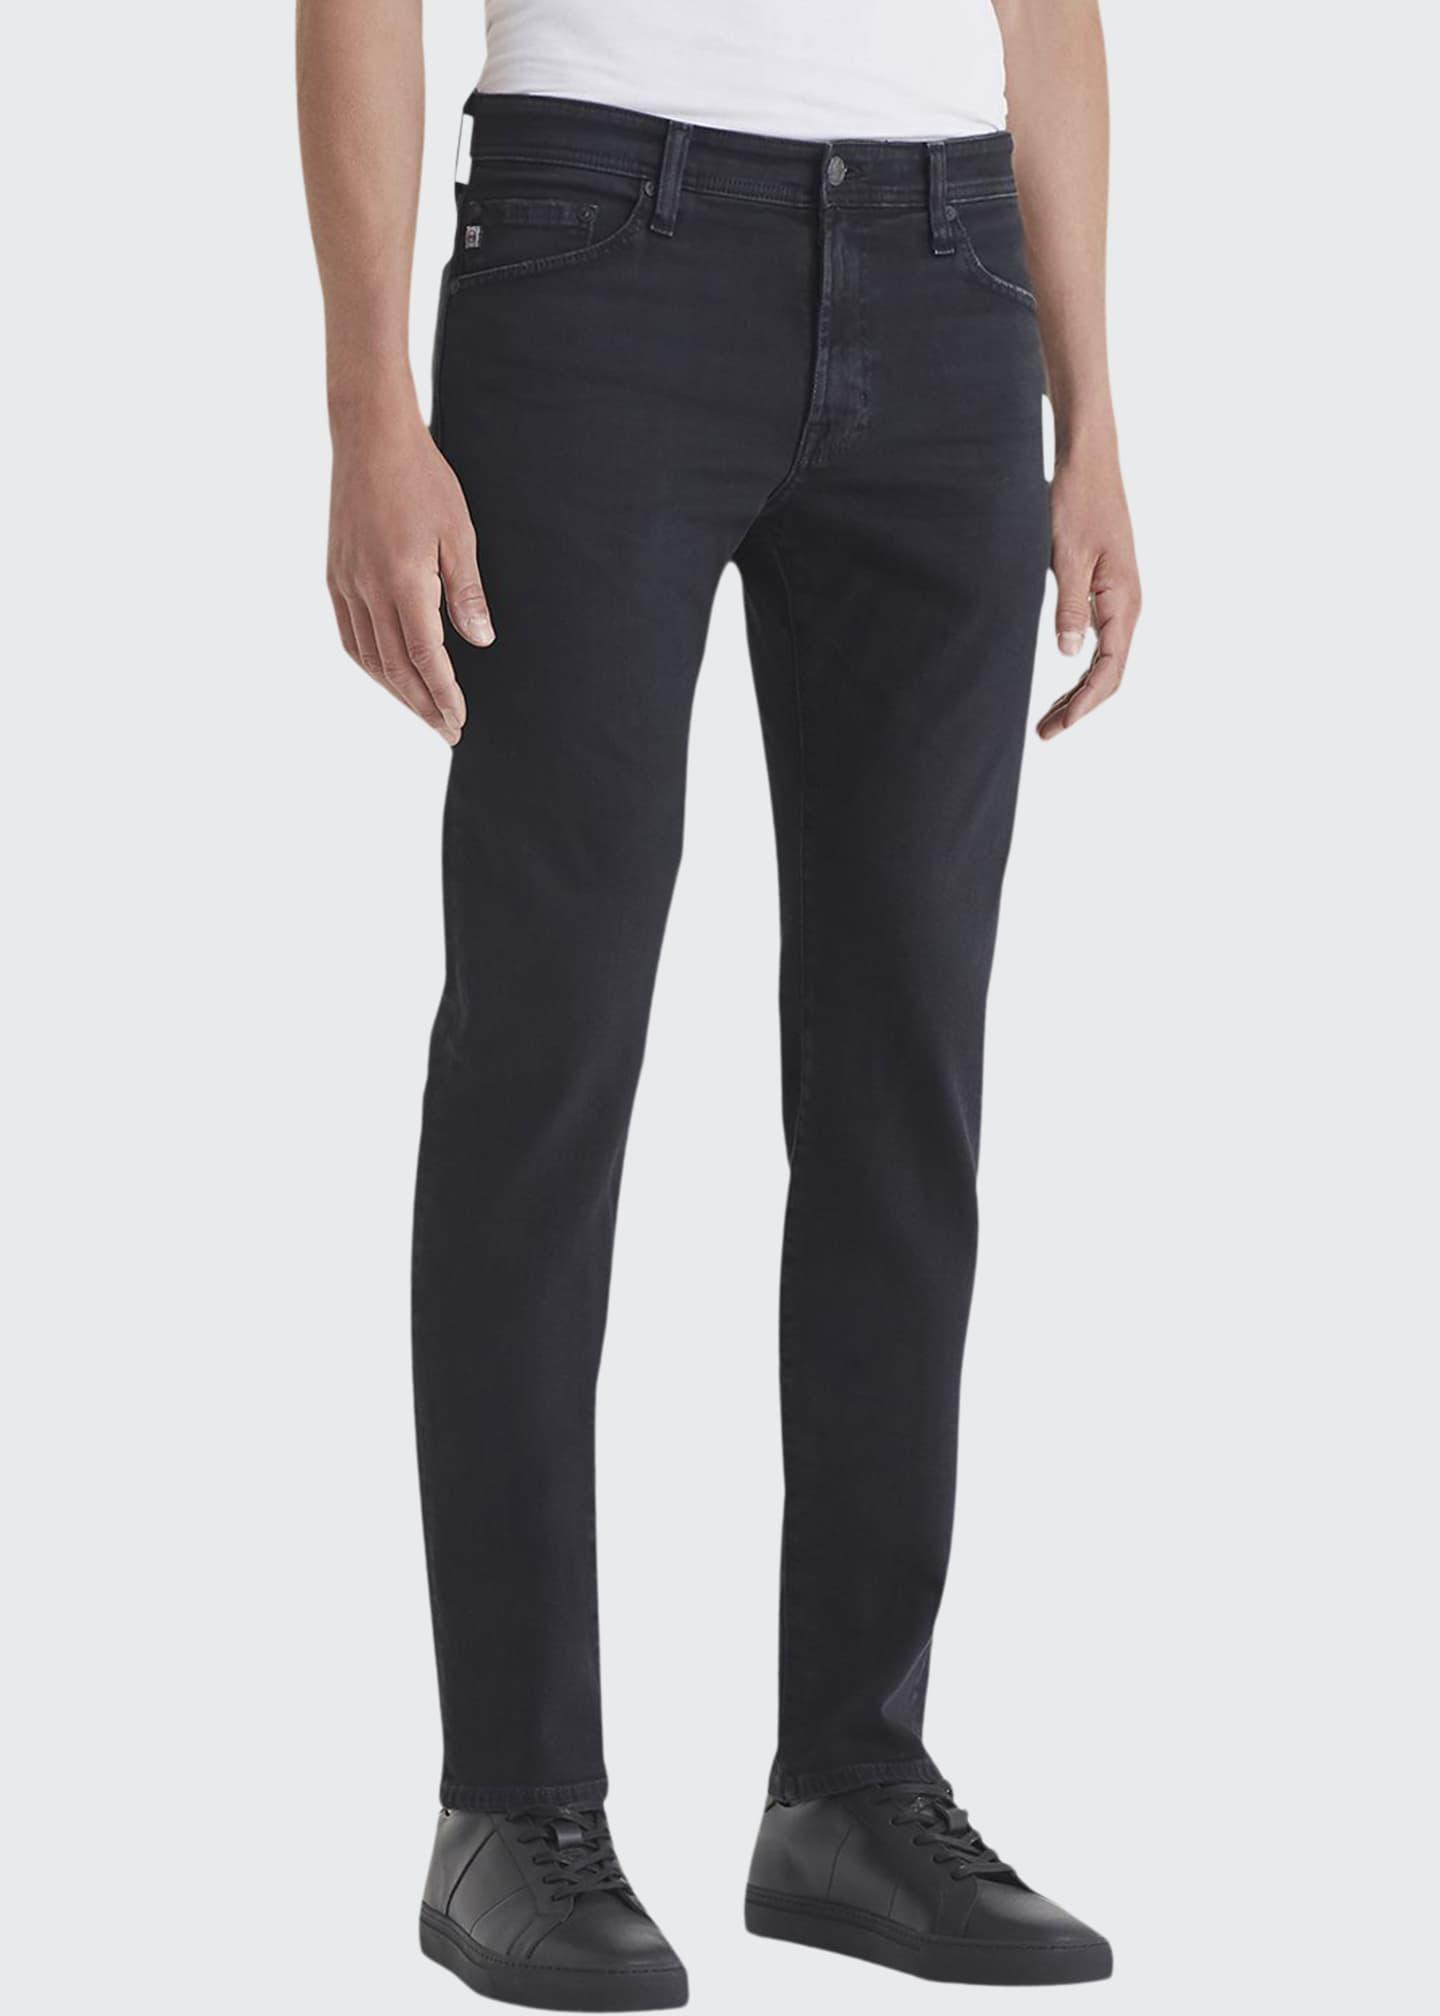 AG Adriano Goldschmied Men's Tellis Slim-Leg Twill Pants